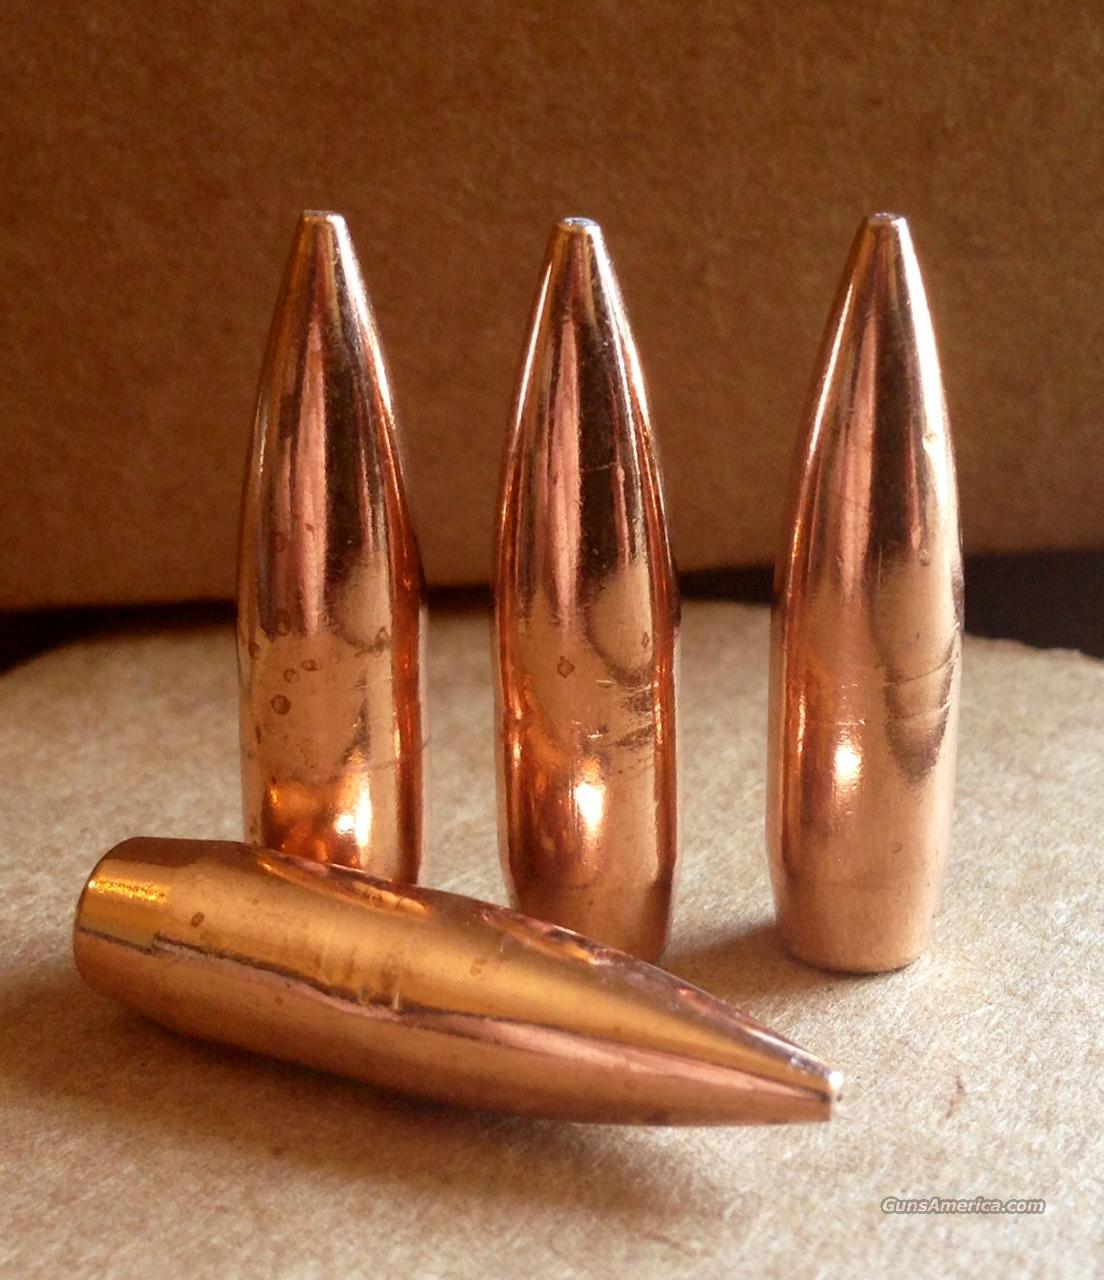 150 - Sierra MatchKing SMK 175 Grain 30 Cal Bullets - Pull Downs -